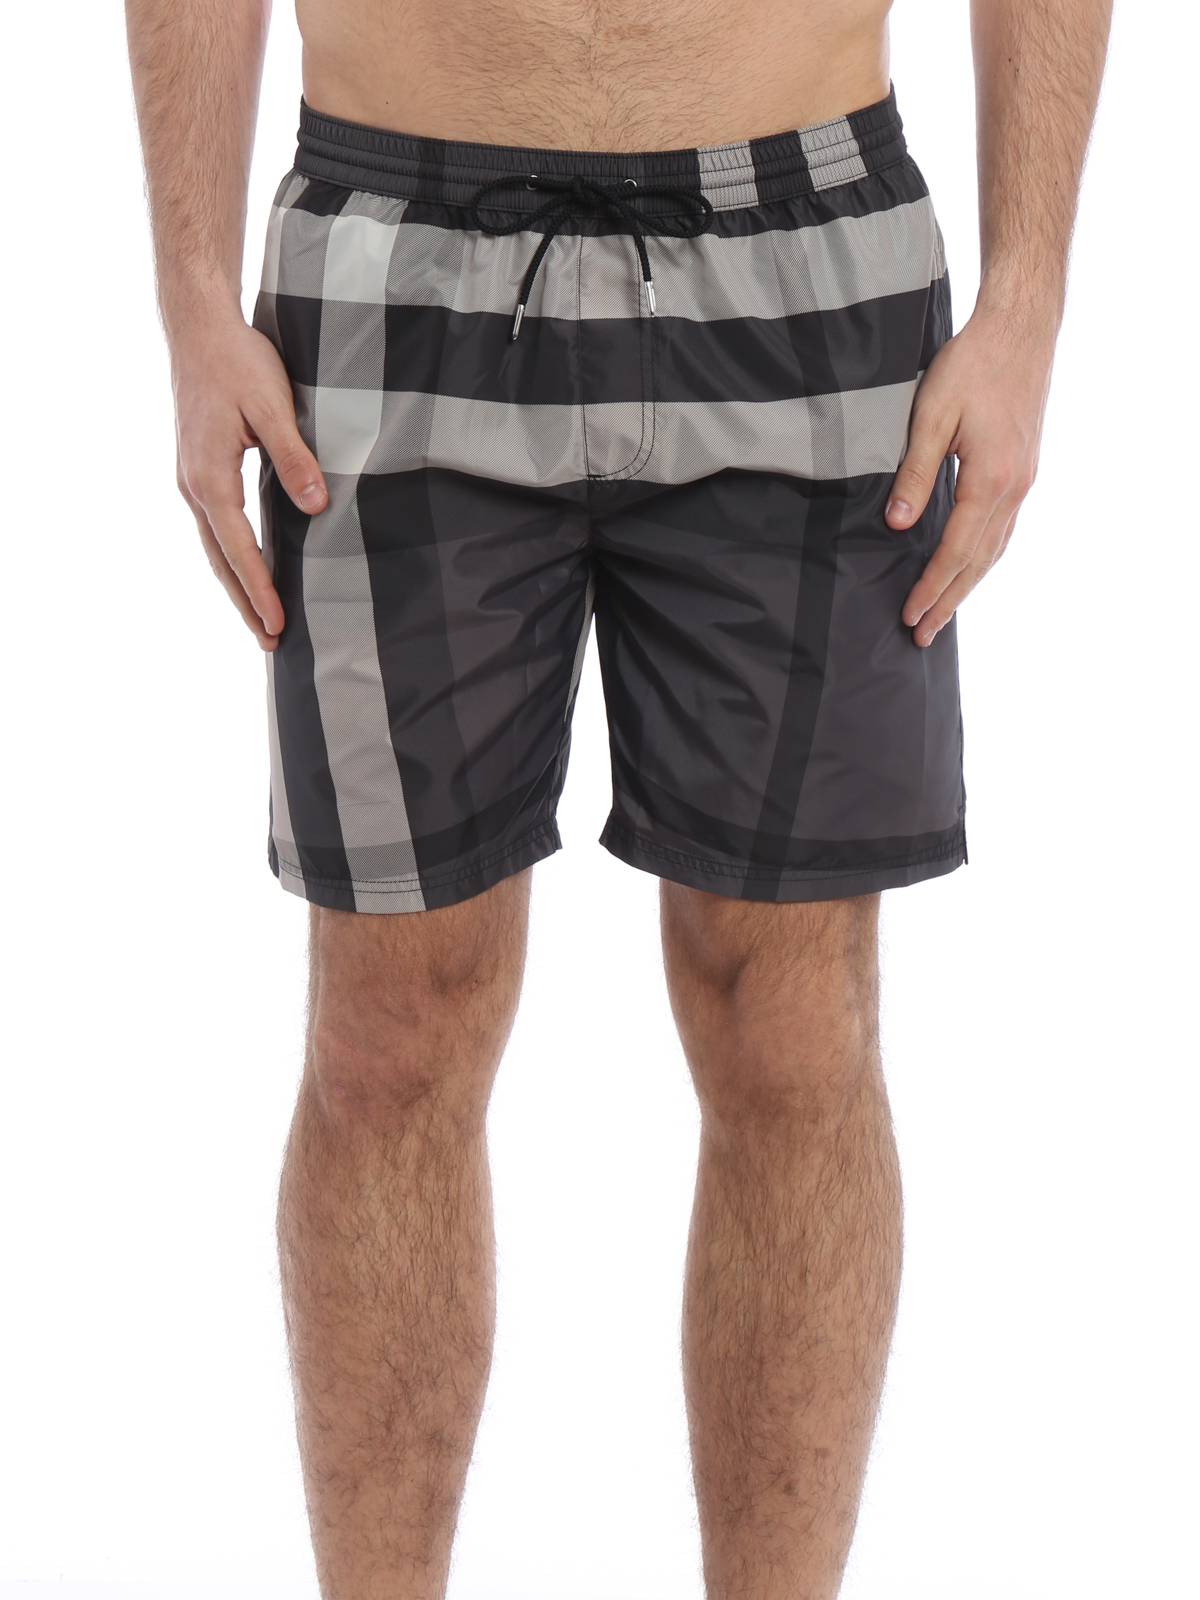 3a8a7c42f0 iKRIX BURBERRY: Swim shorts & swimming trunks - Check pattern swimming  shorts